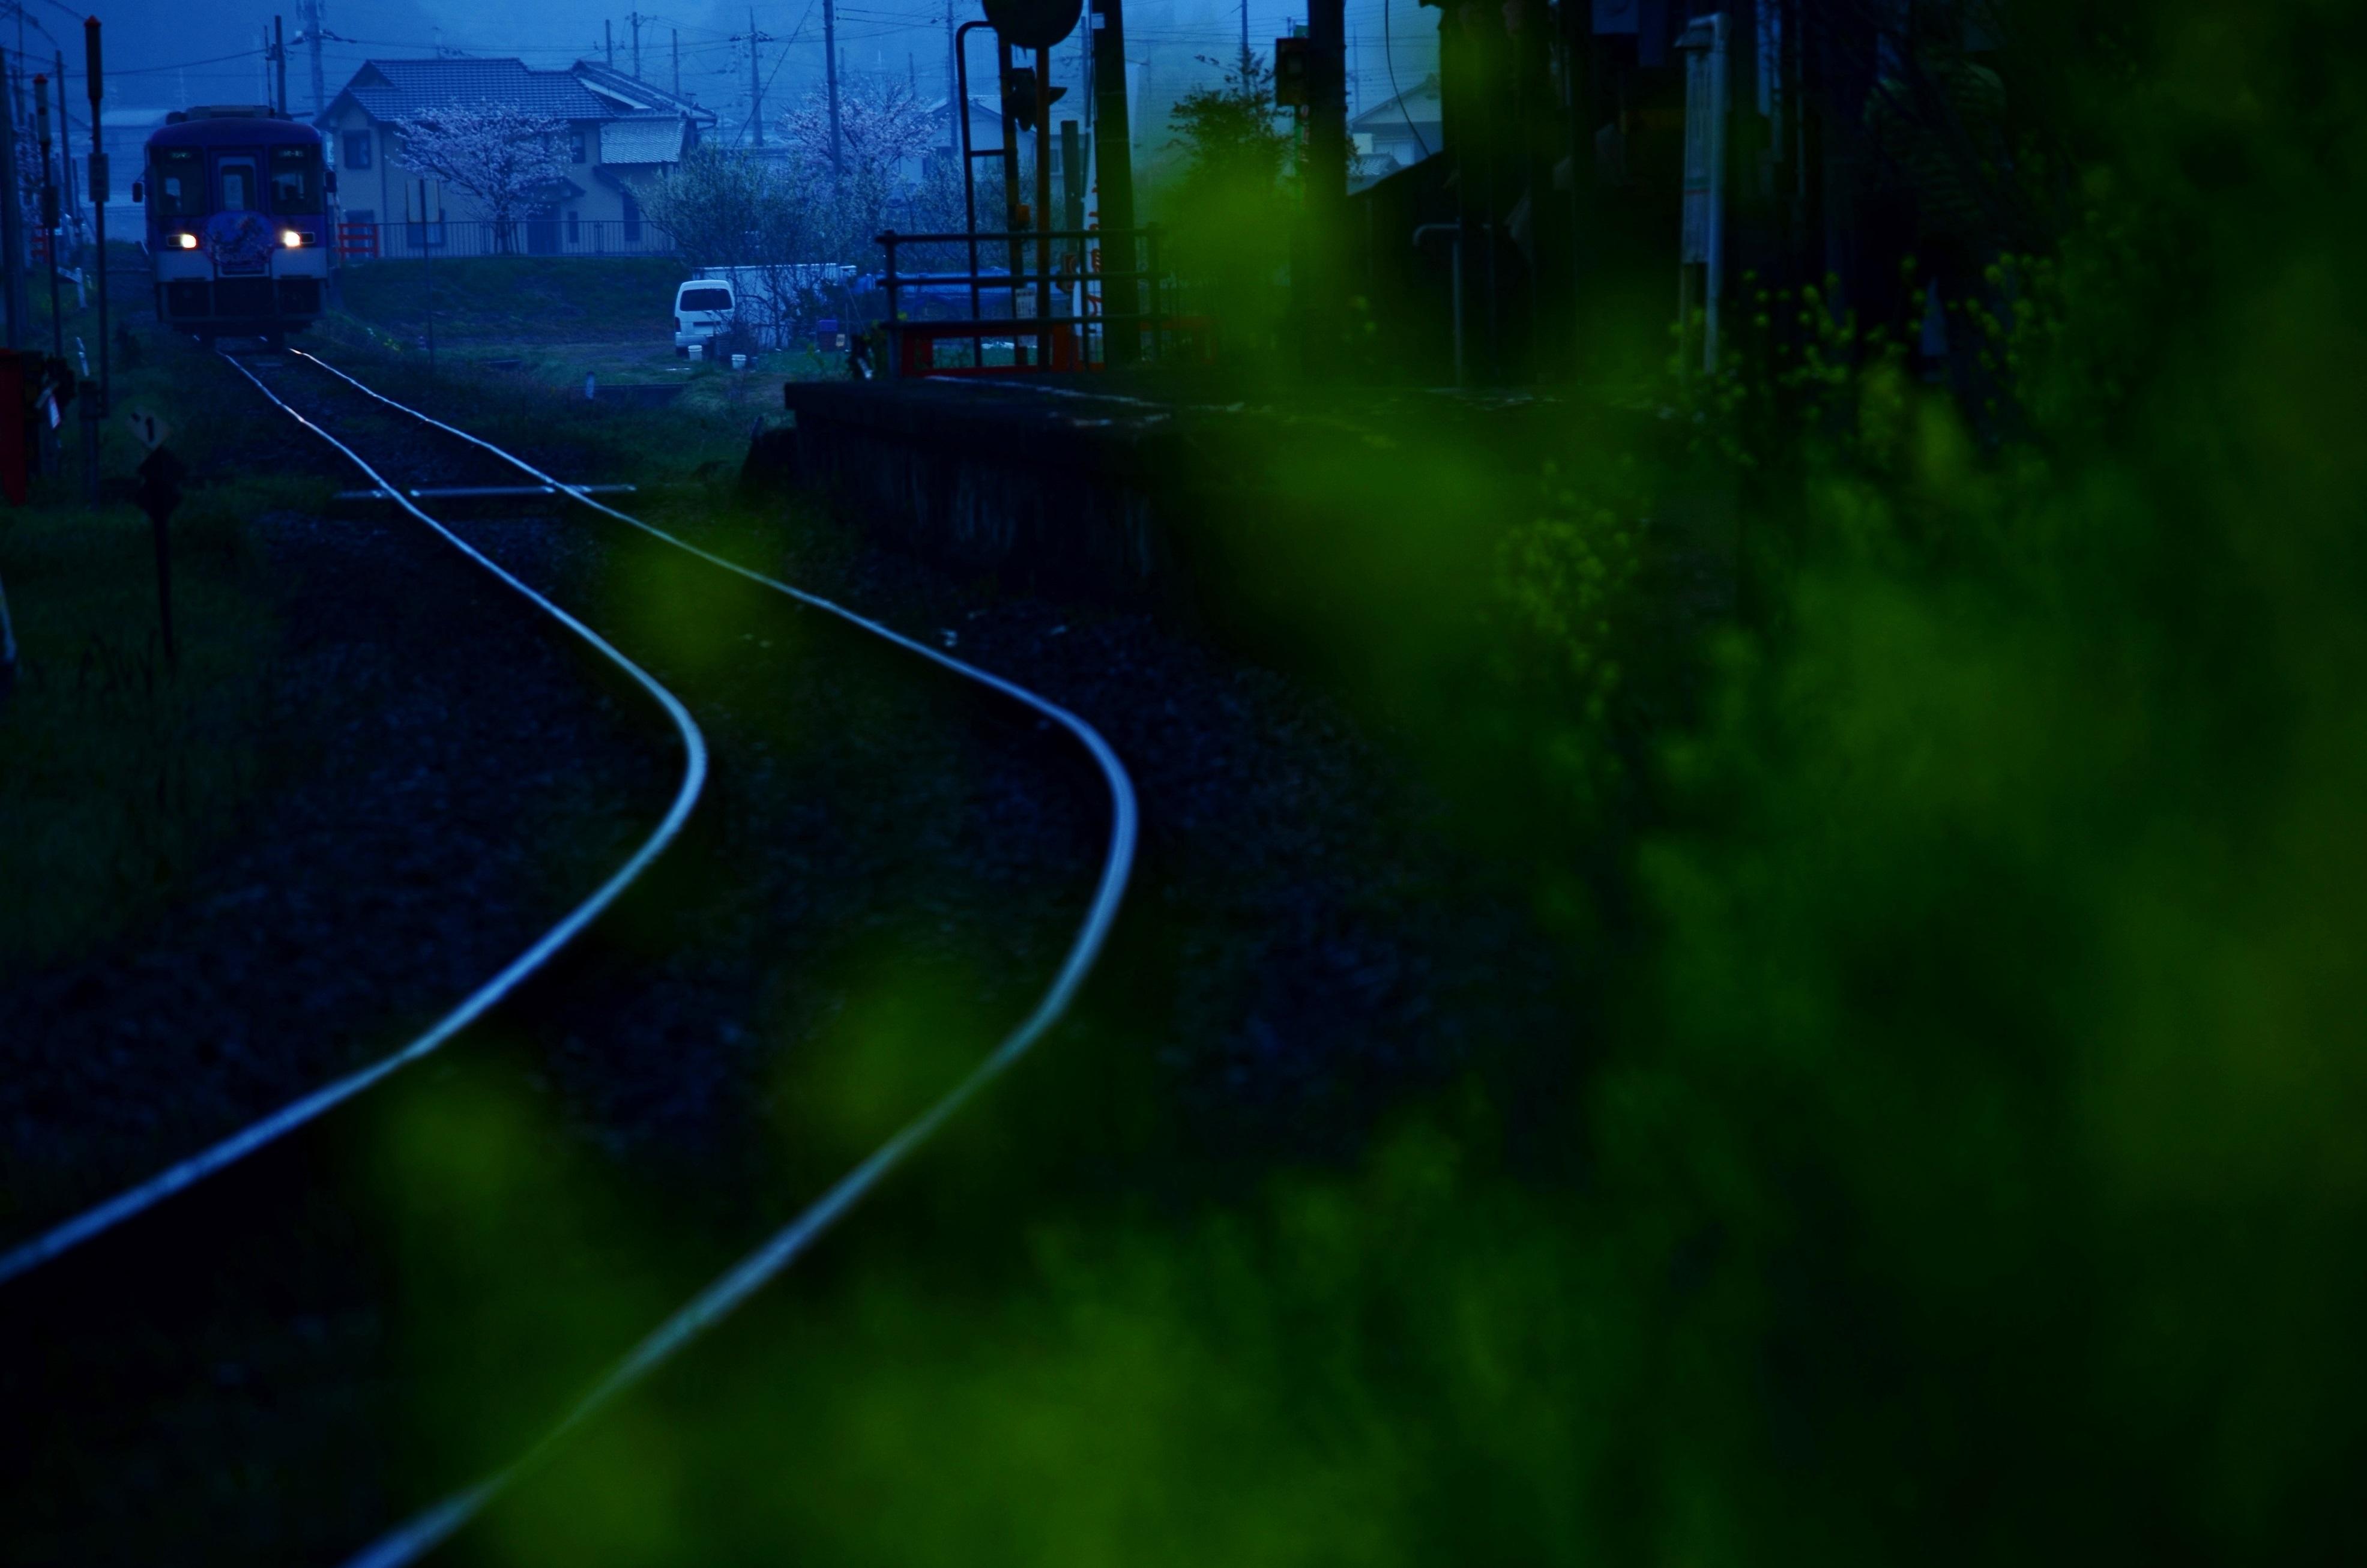 DSC_7437.jpg